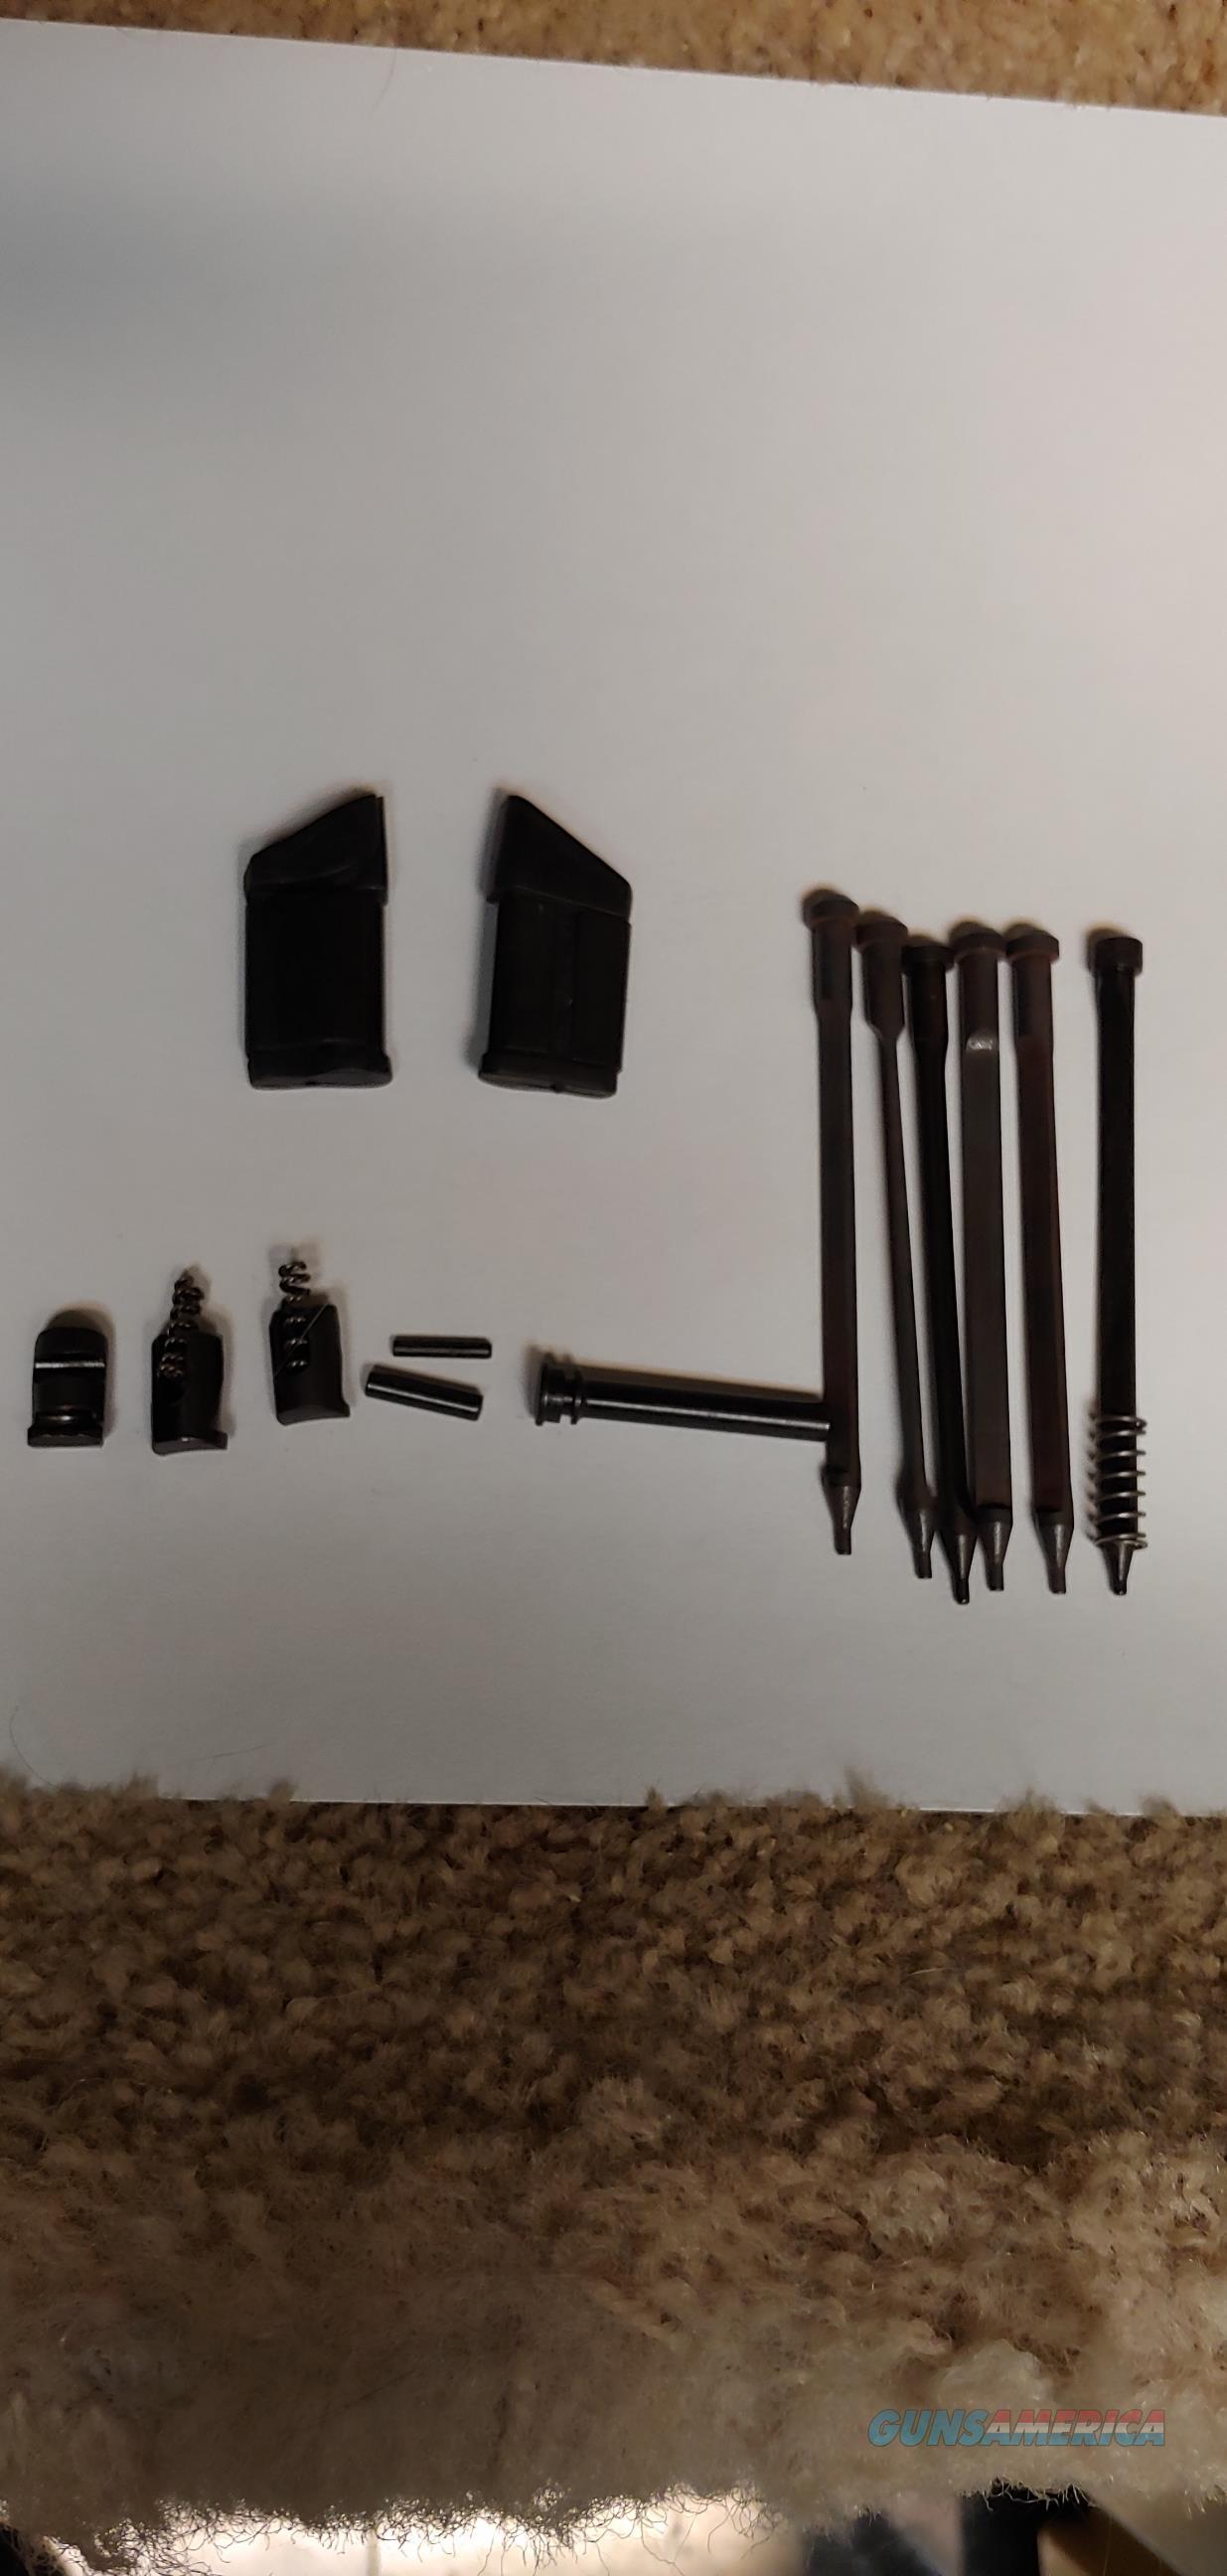 Brand New Factory Valmet 76 223 Parts  Guns > Rifles > Valmet Rifles